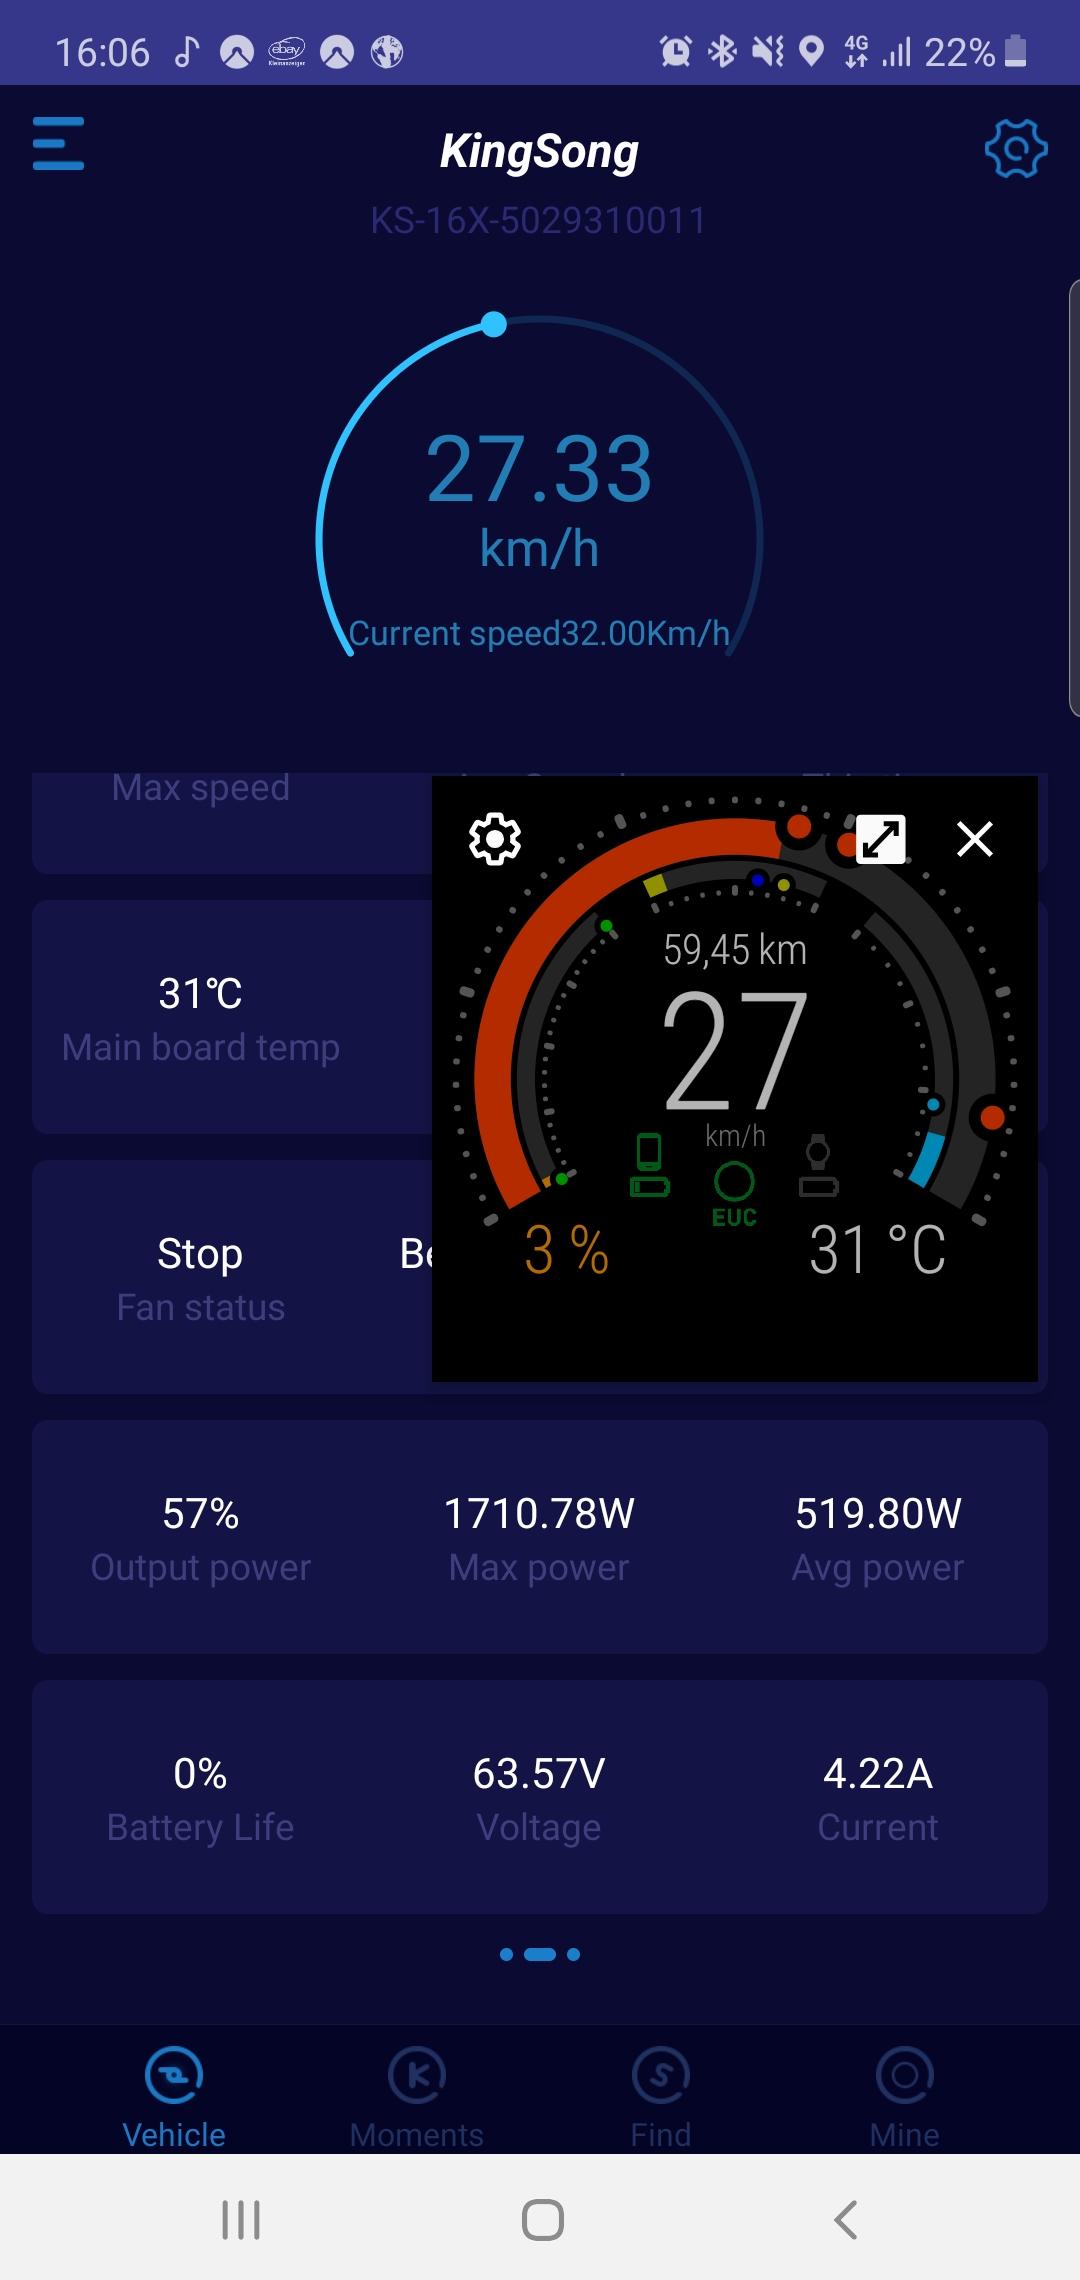 Screenshot-20191204-160652-Kingsong.jpg